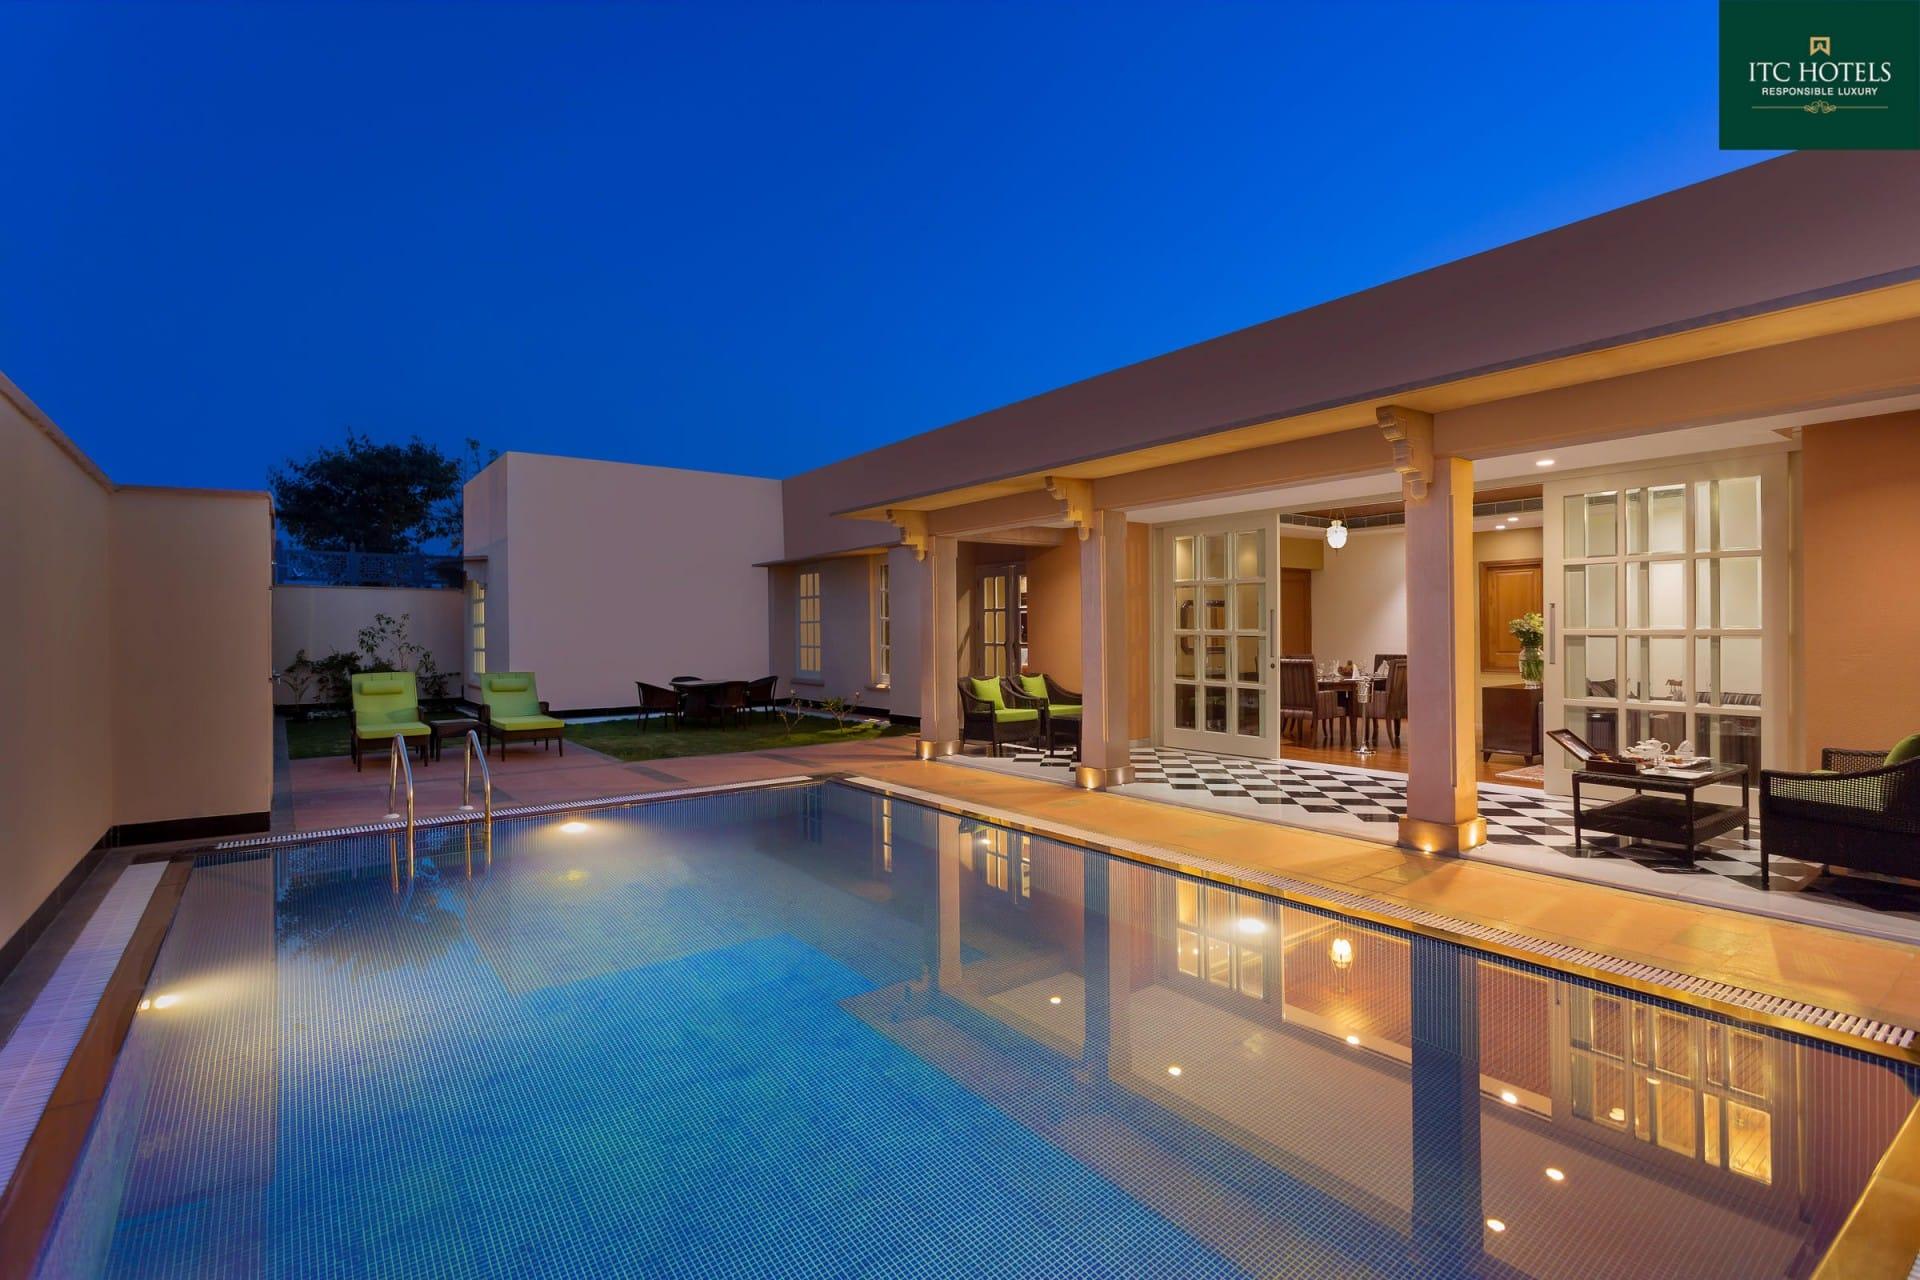 Best Architecture Photographer Jodhpur   ITC Hotel Swimming Pool Photography India